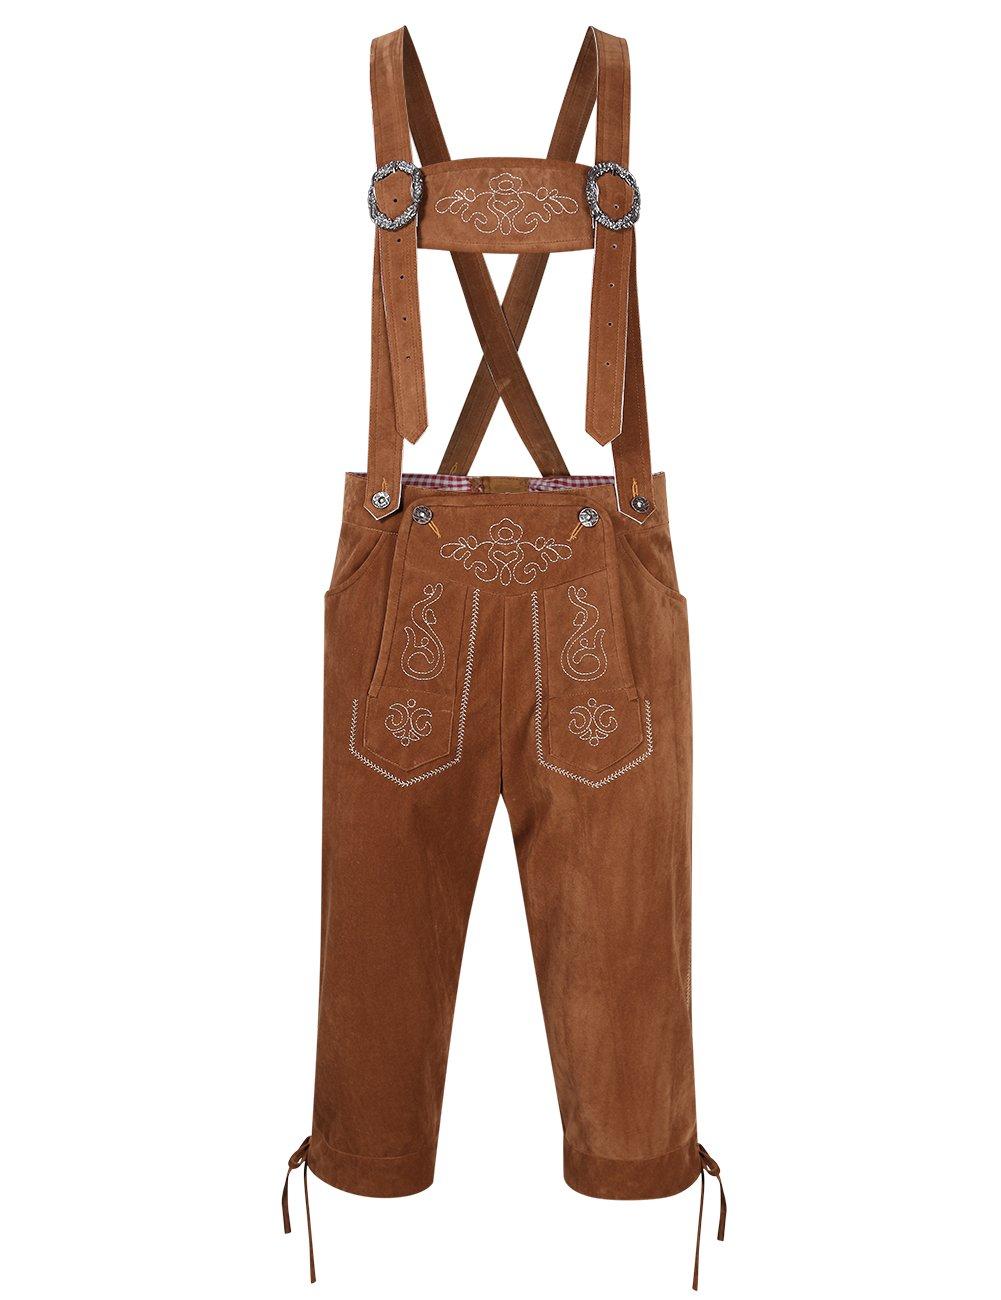 Clearlove Men's Stylish Embroidery Strap Pants Vintage Faux Fleece Party Dress Pants for Oktoberfest Khaki L